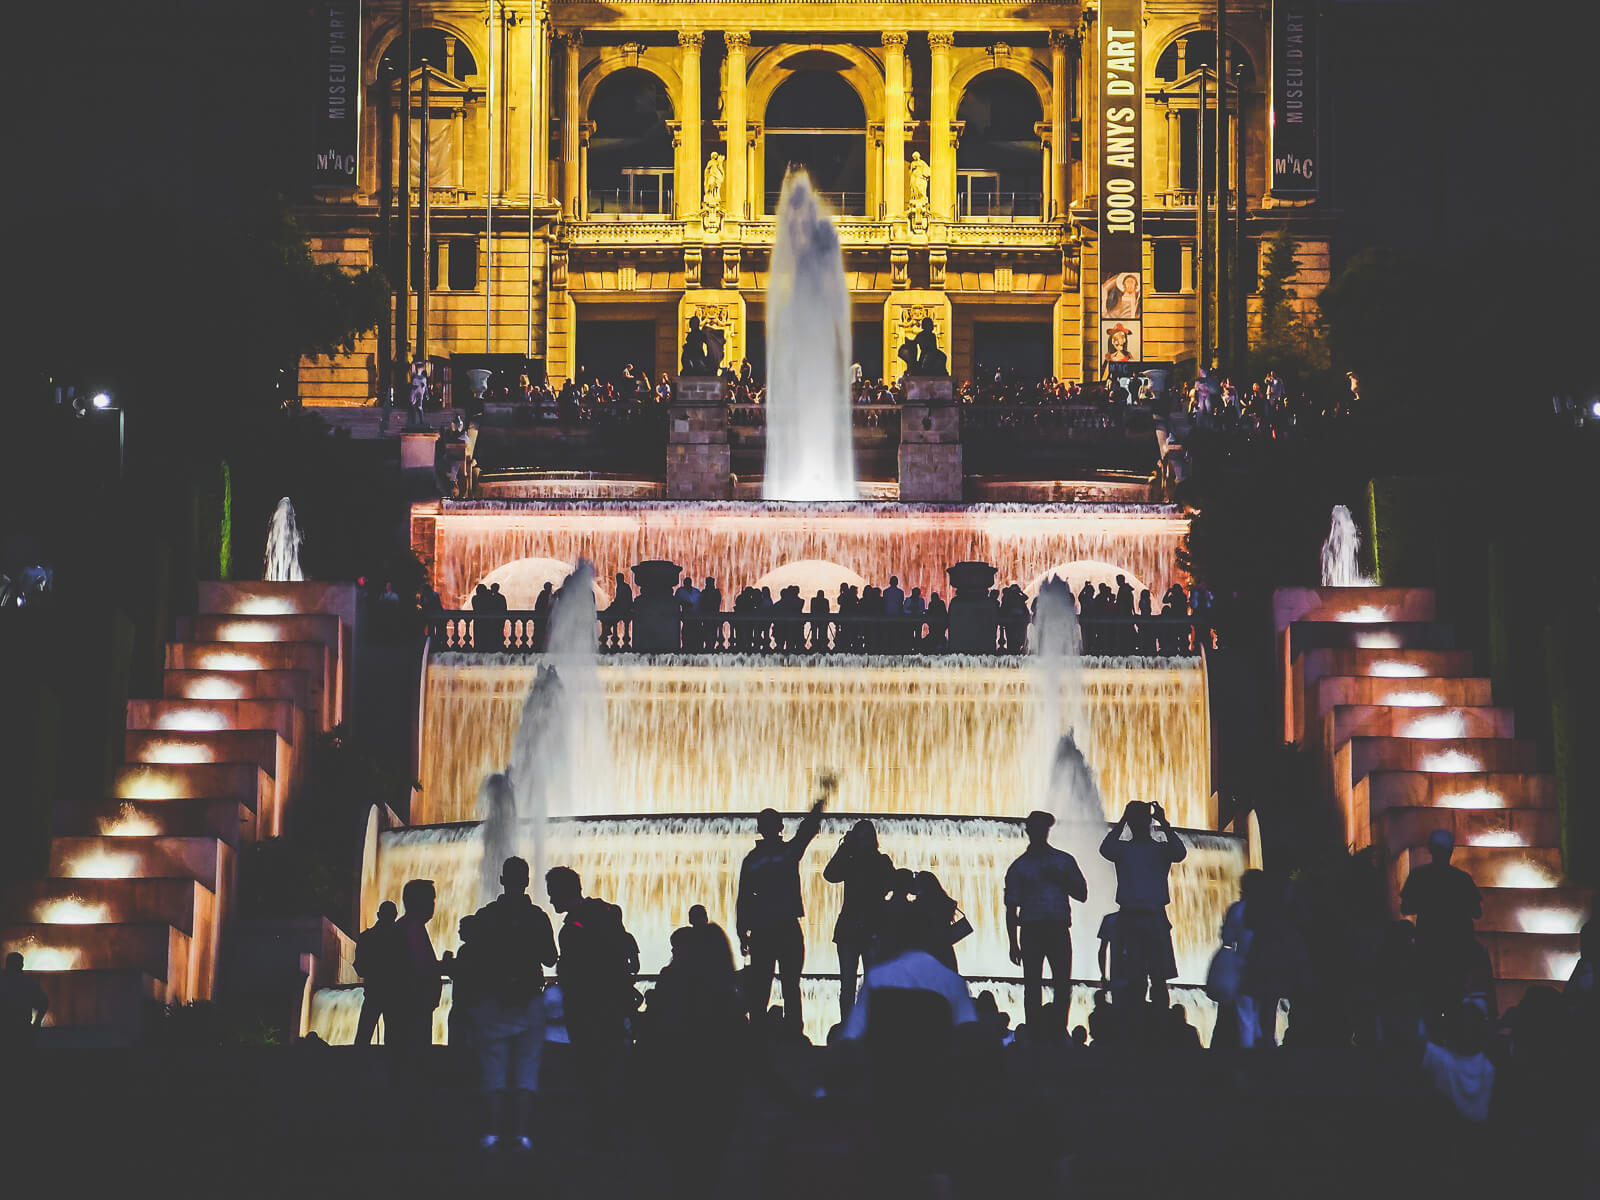 Barcelona Street Photography, Mnac front, Montjuic fountain, Museu Nacional Art Catalunya, silhouette spectating